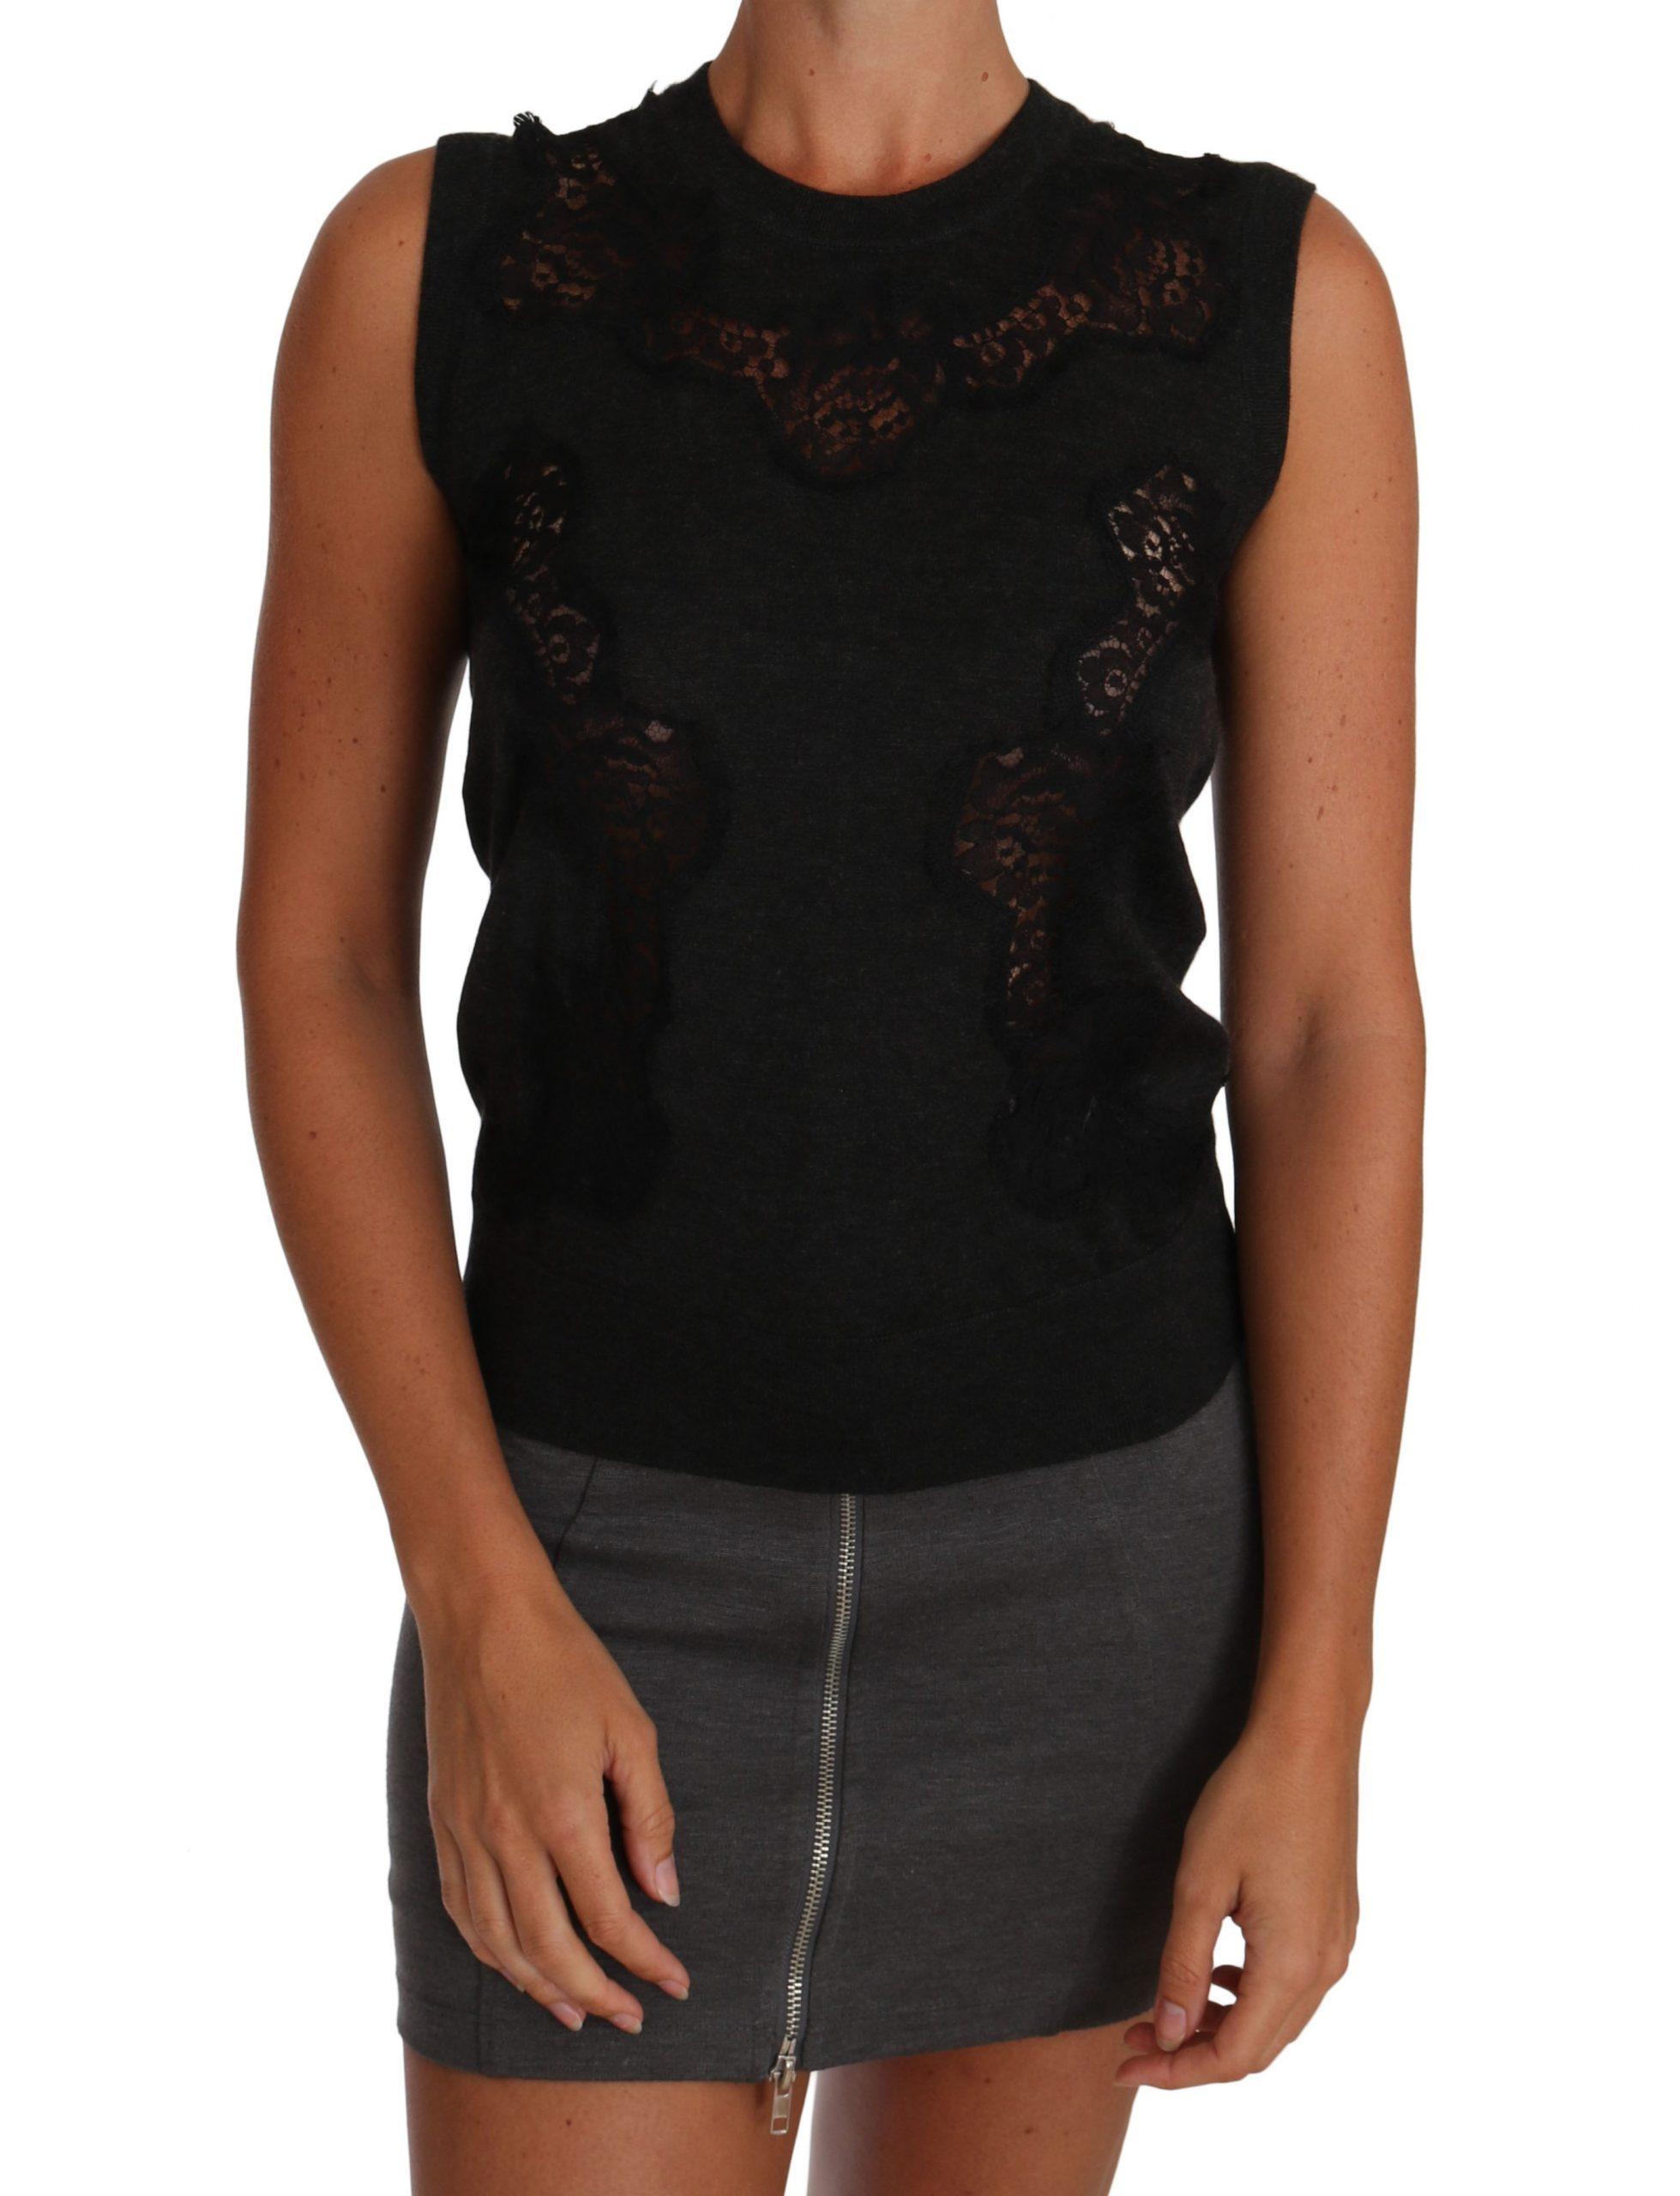 Dolce & Gabbana Women's Silk Cutout Tops Gray TSH2385 - IT40|S